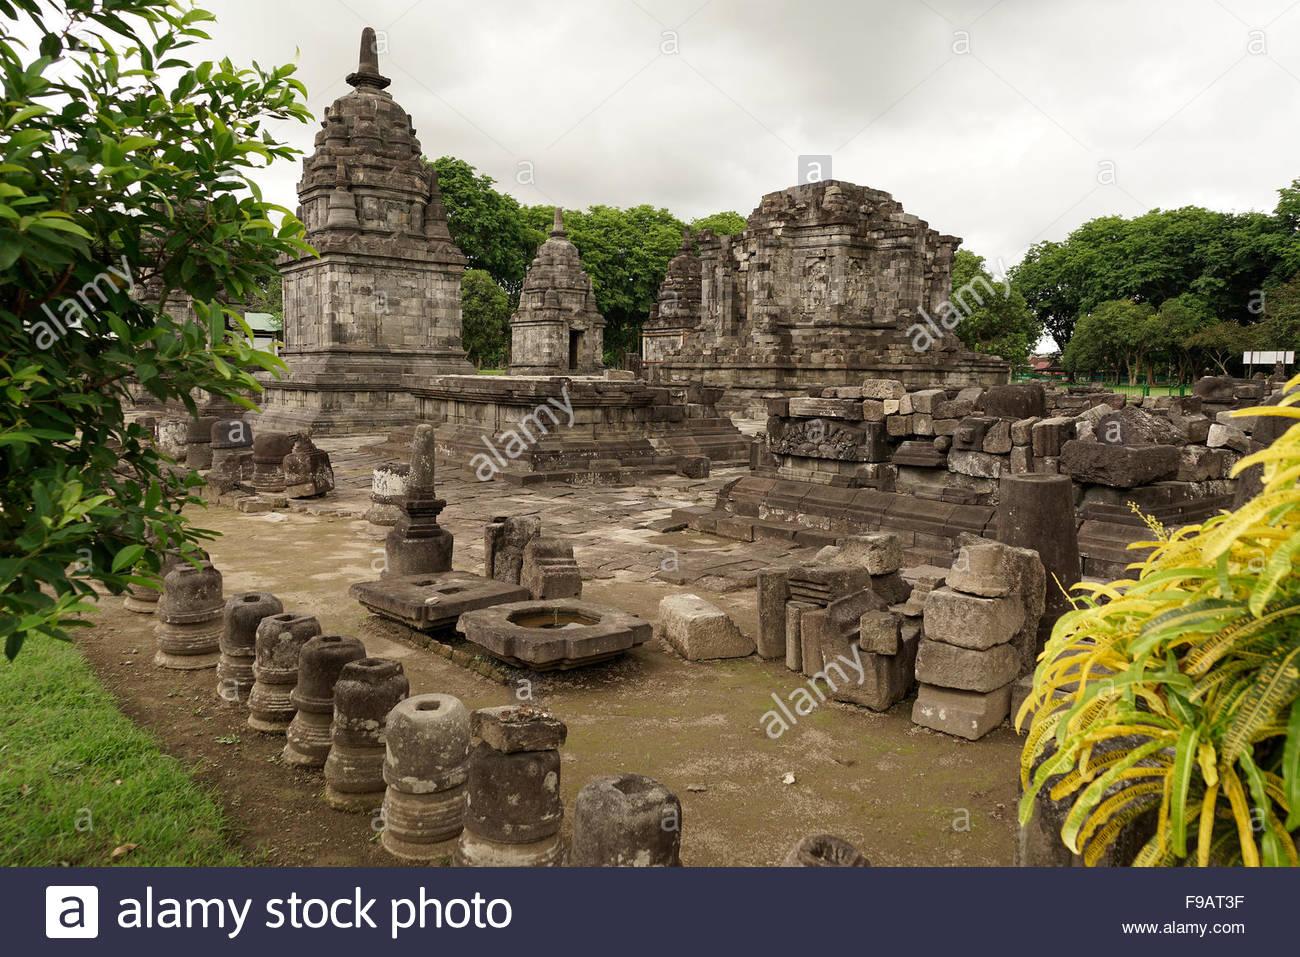 Candi Lumbung Temple Part 9th Century Hindu Compound Prambanan Central